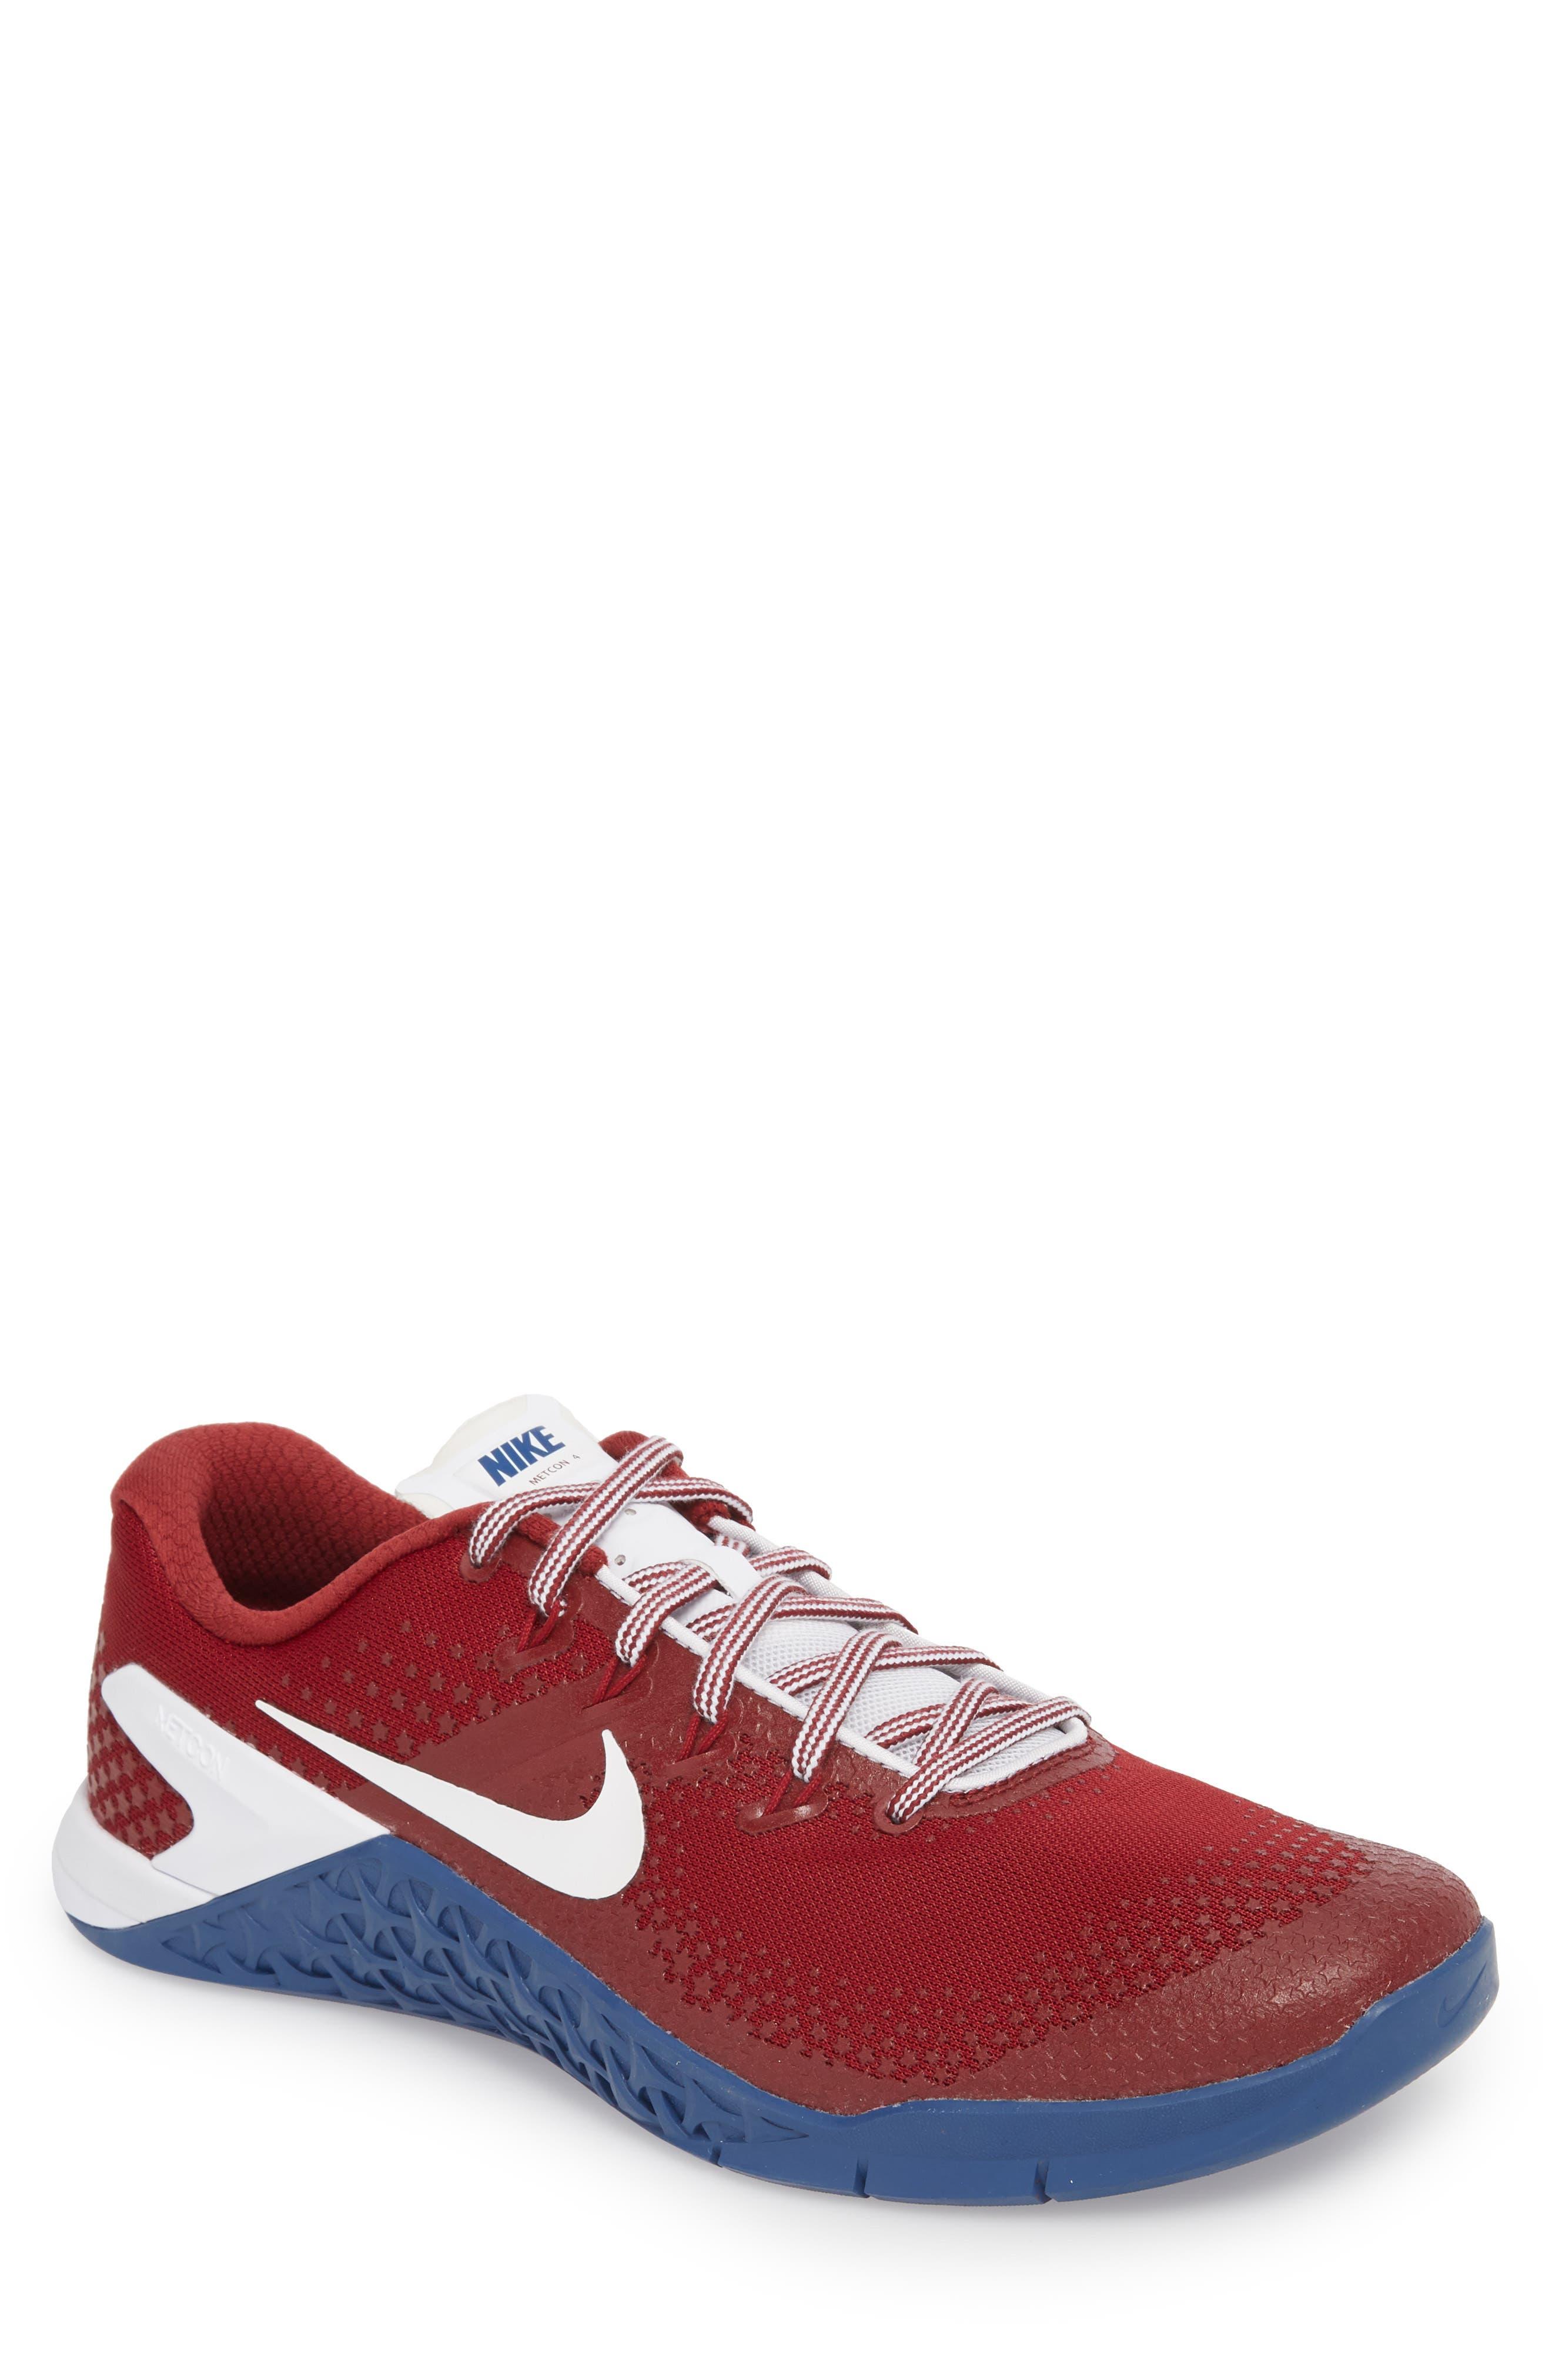 Metcon 4 Americana Training Shoe,                         Main,                         color, TEAM RED/ WHITE/ GYM BLUE